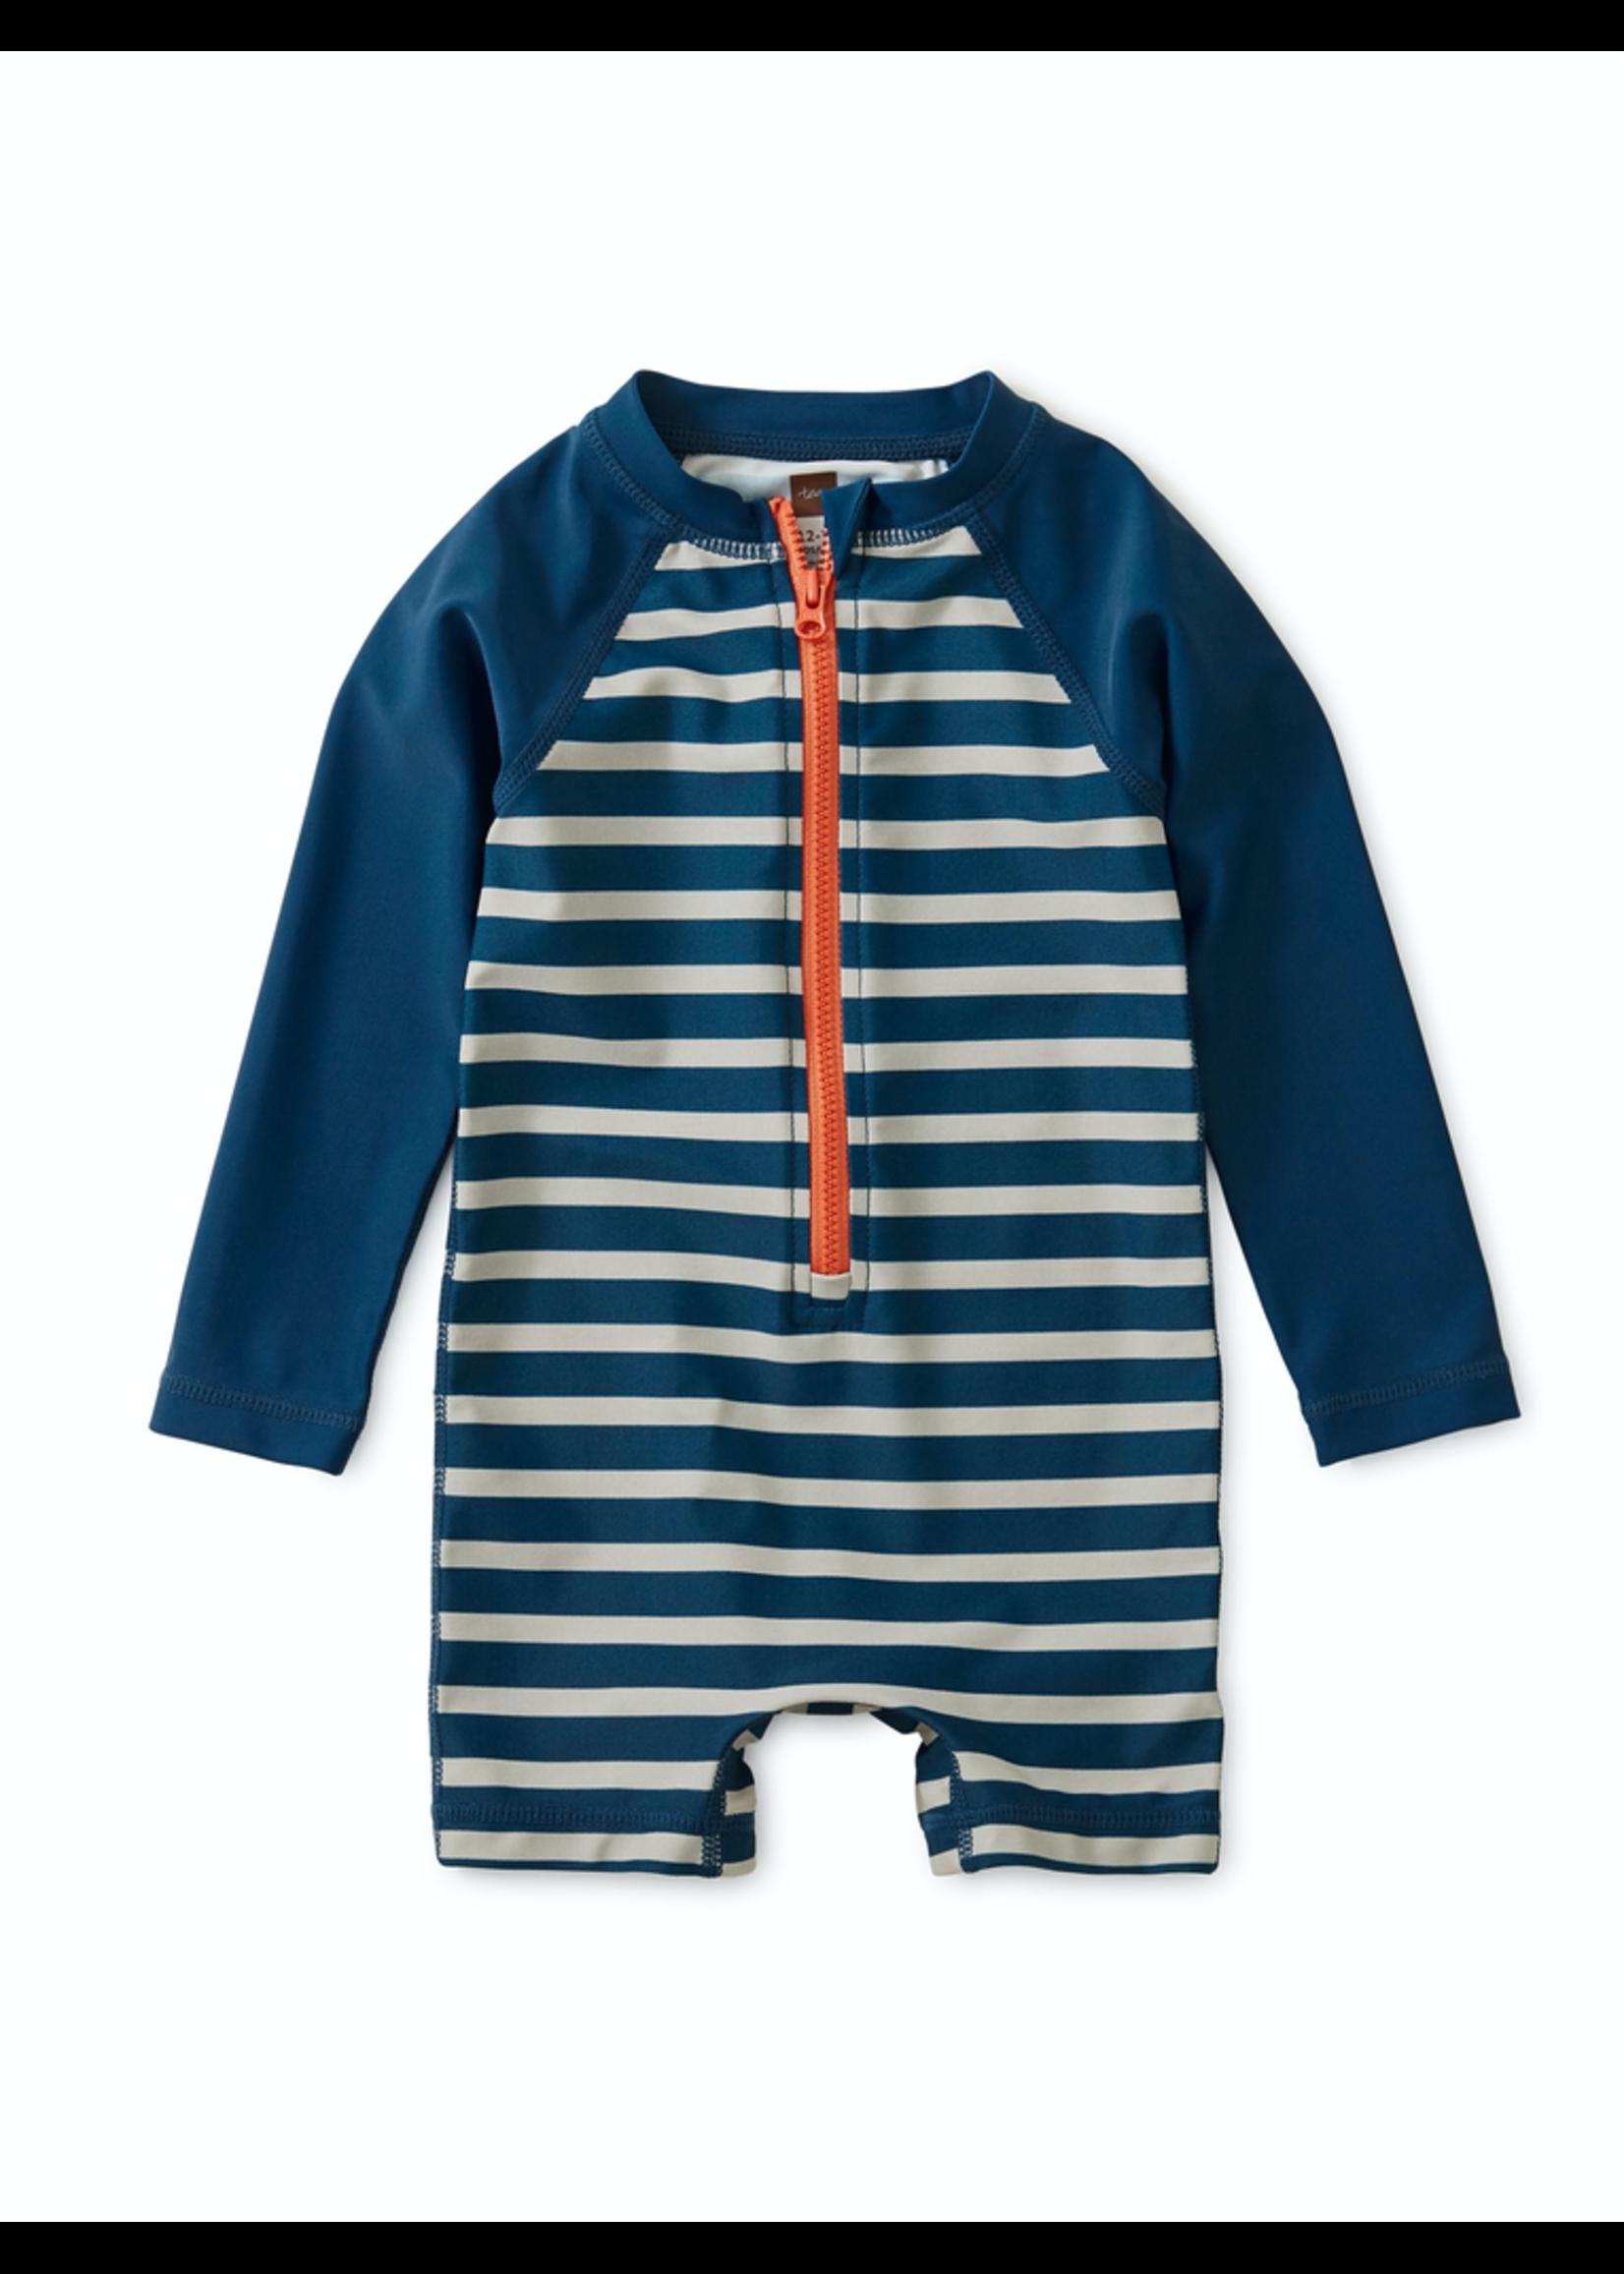 Tea Collection Tea Collection, Striped Zip Rash Guard for Baby Boy